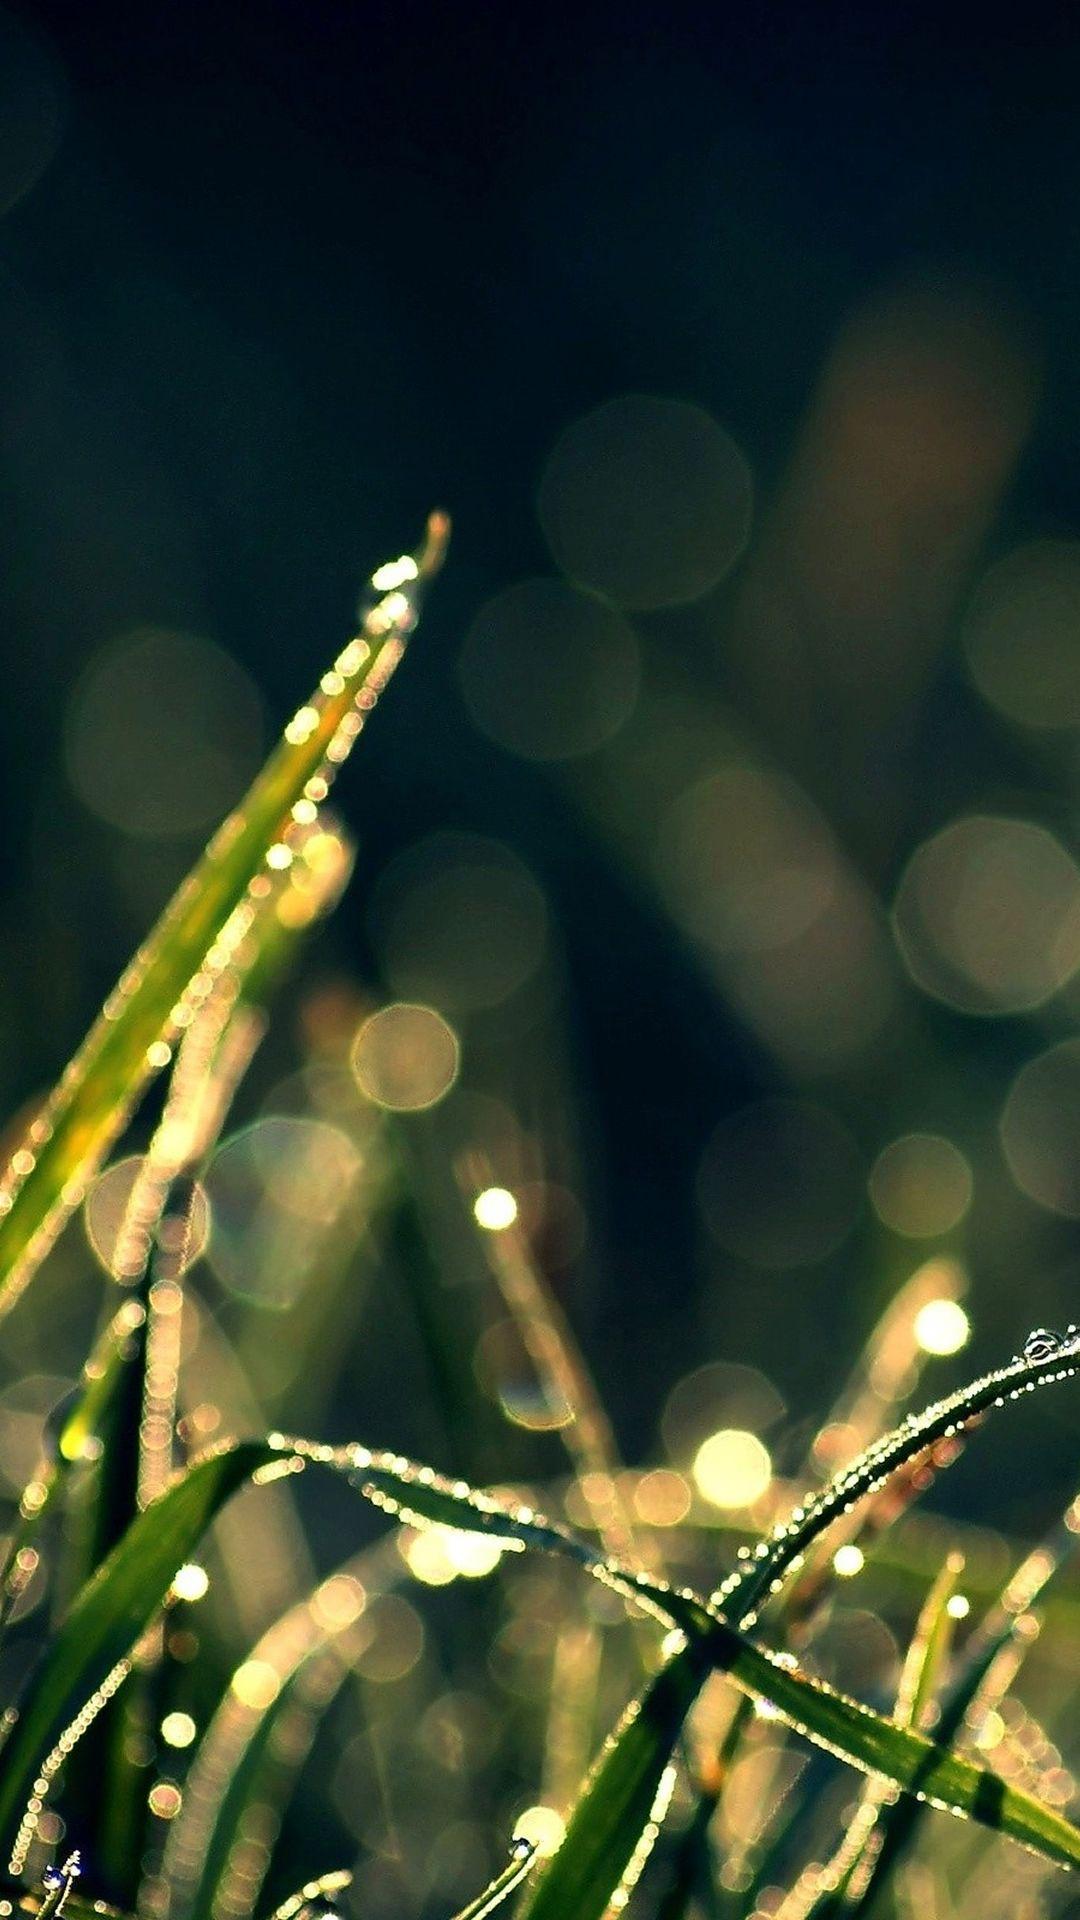 Bokeh Green Grass Drops Iphone 6 Plus Wallpaper